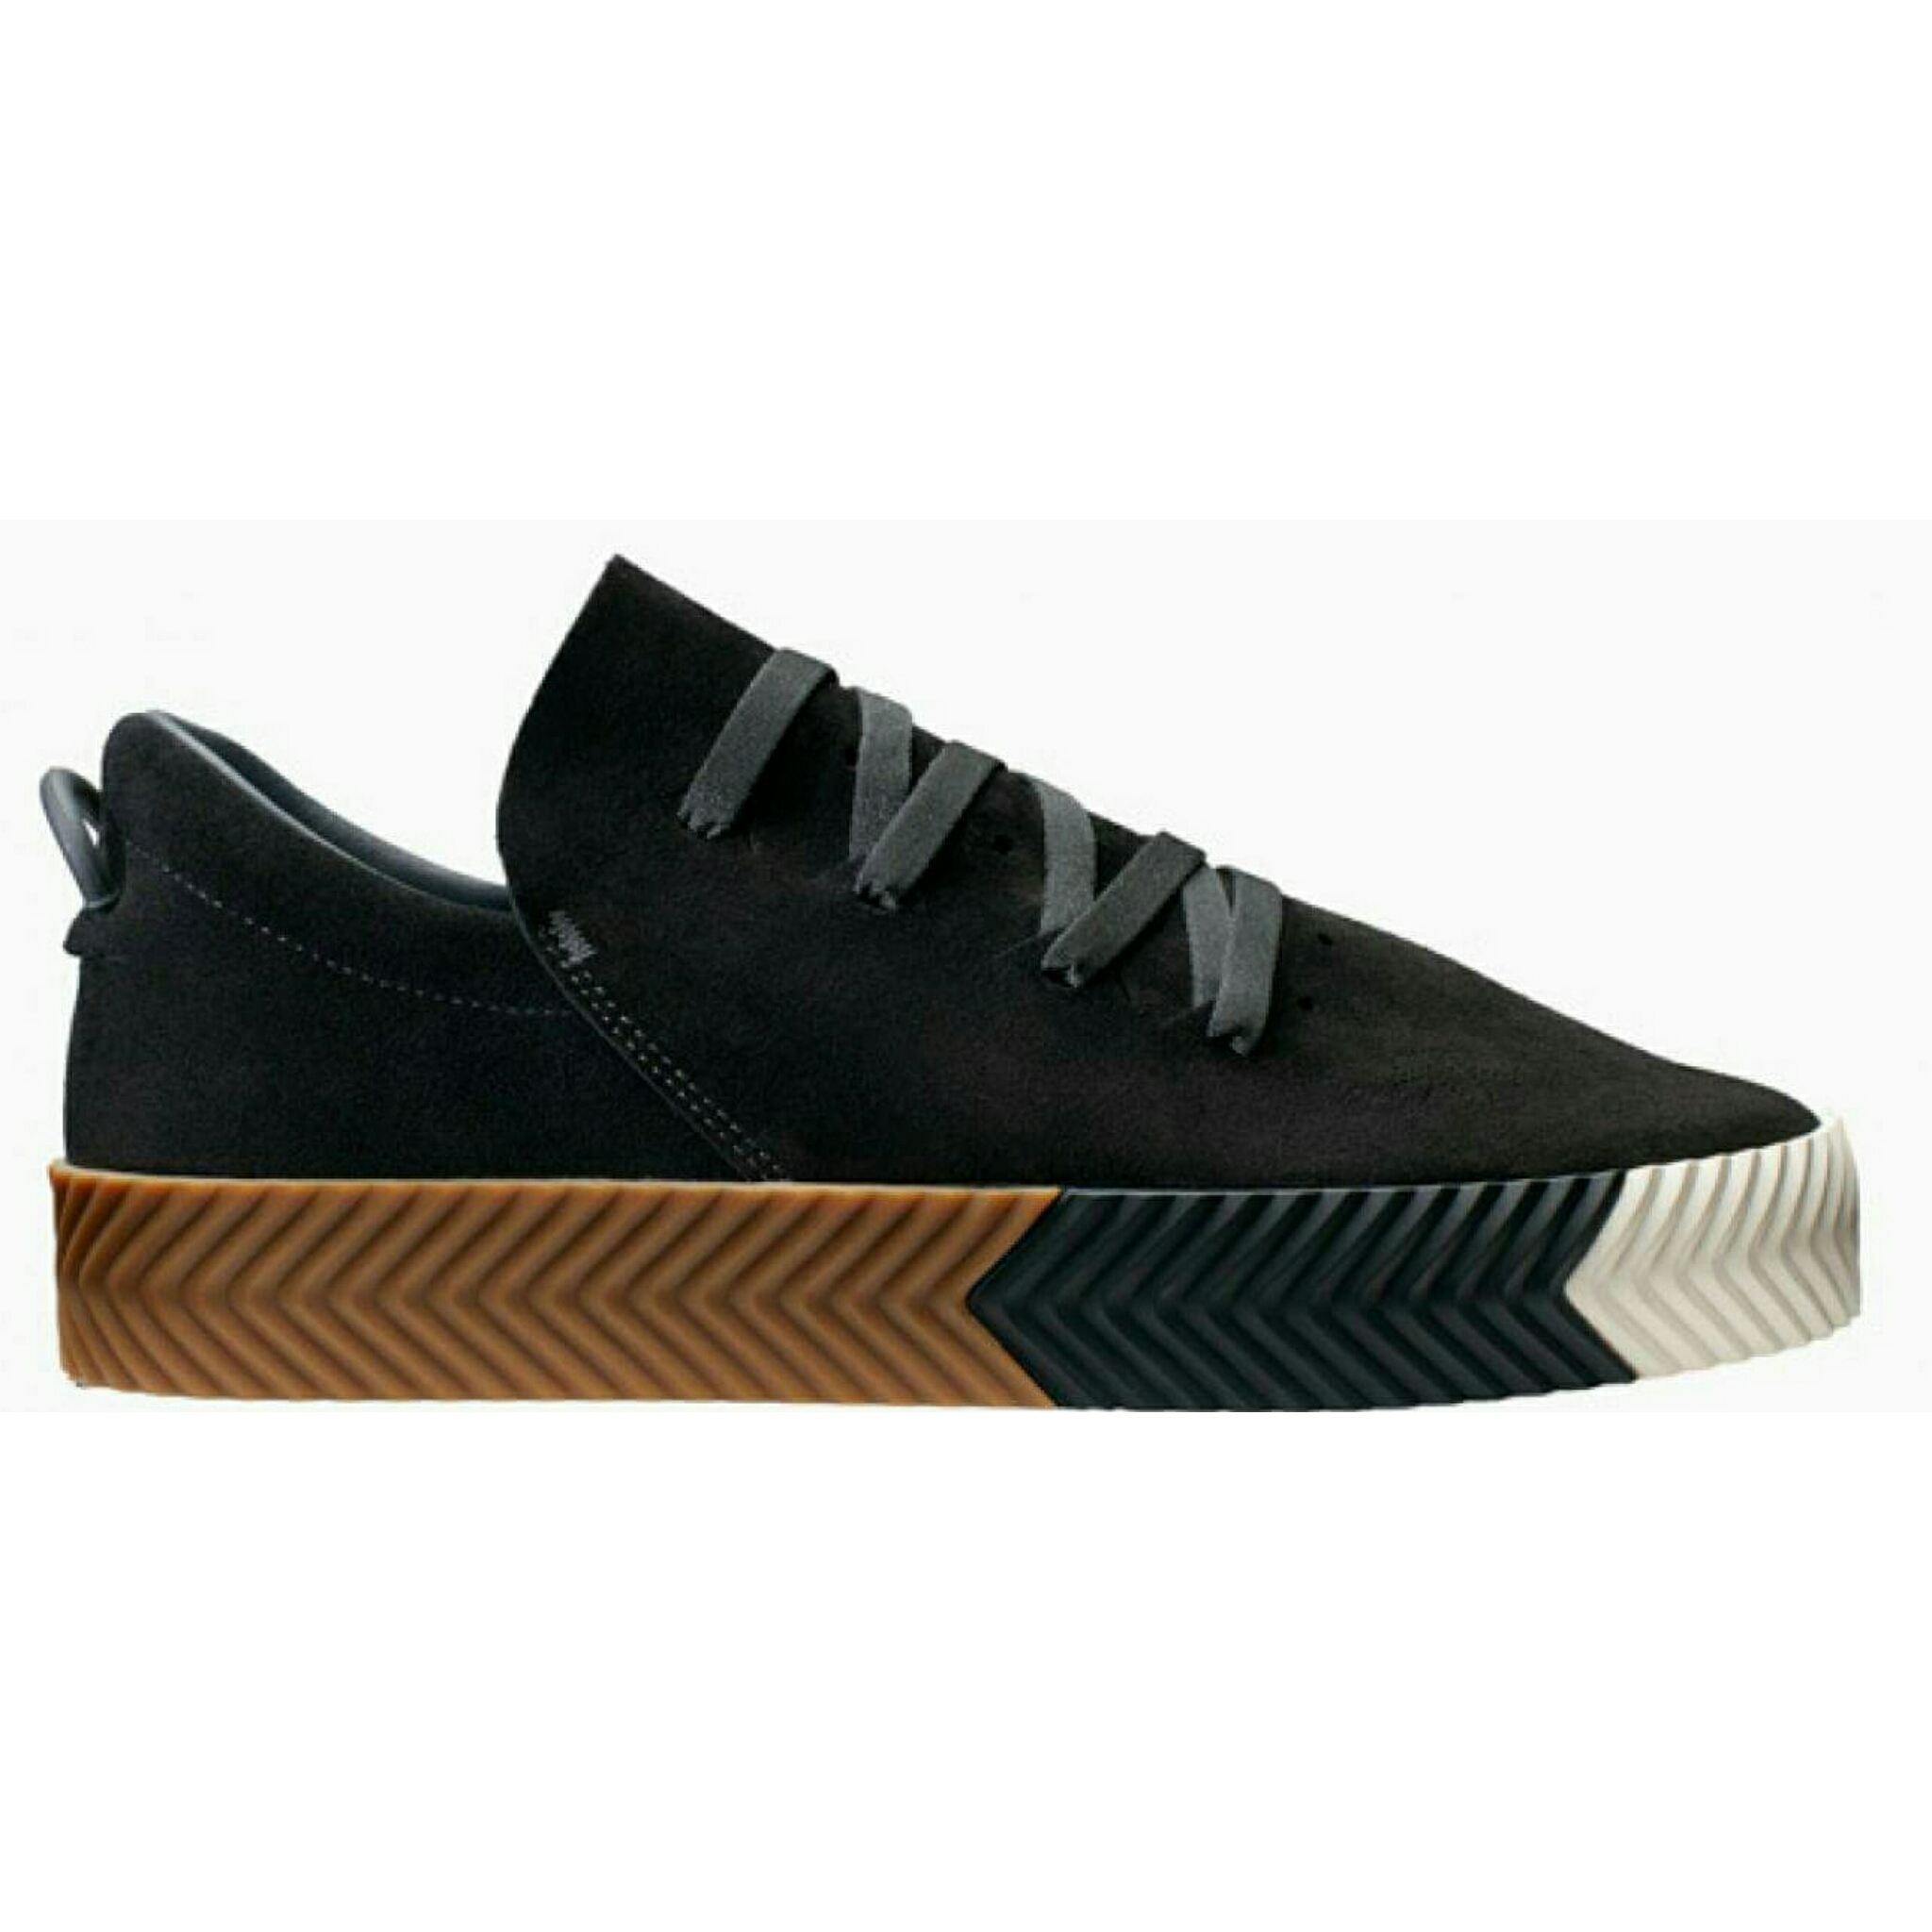 adidas shoes pakistan online